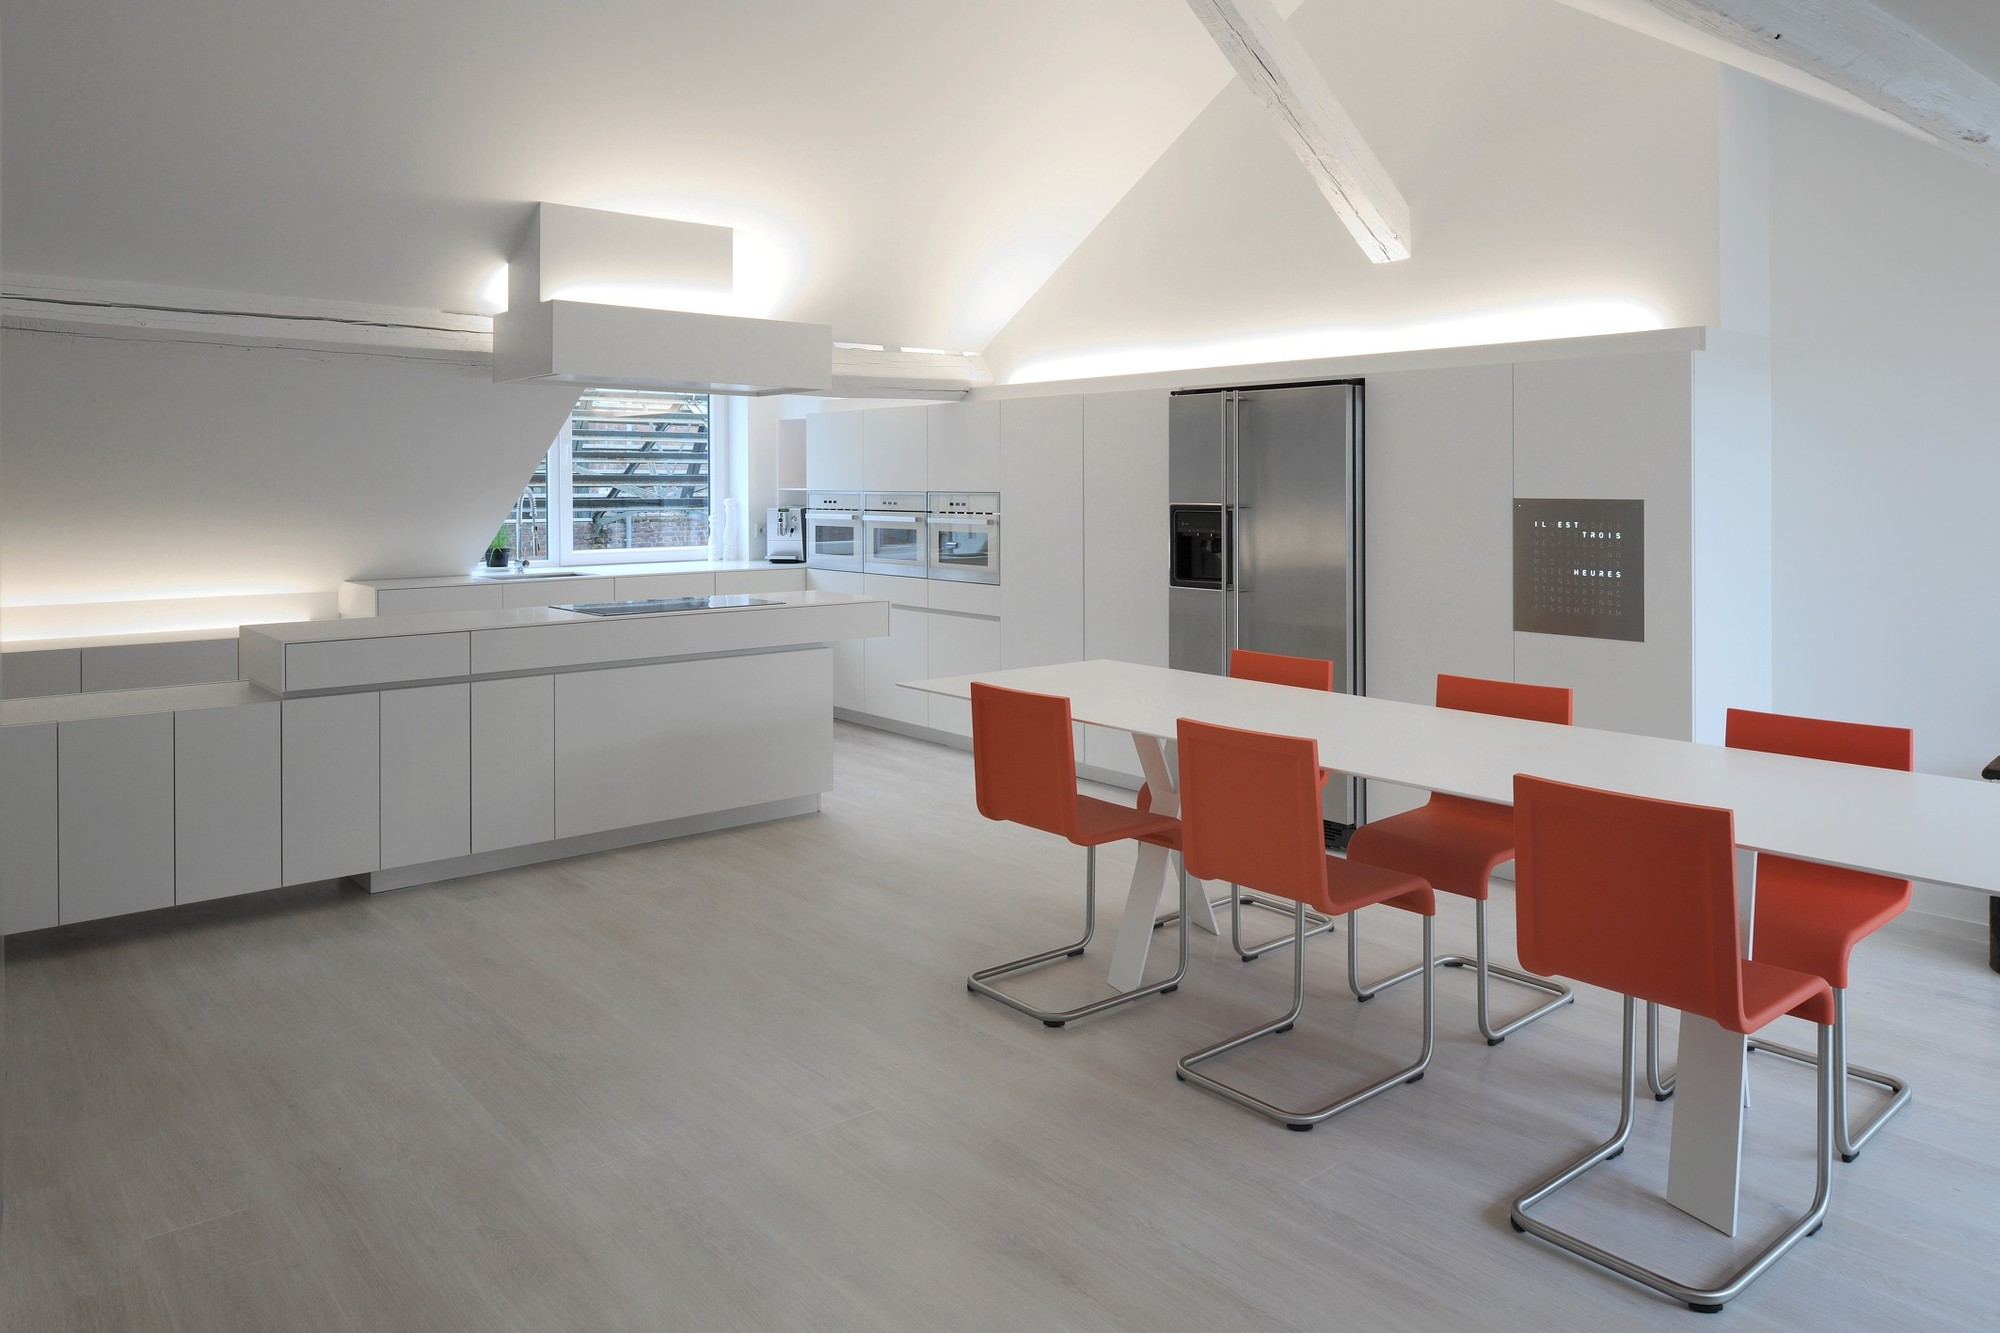 Gallery of Kempart Loft / Dethier Architectures - 3